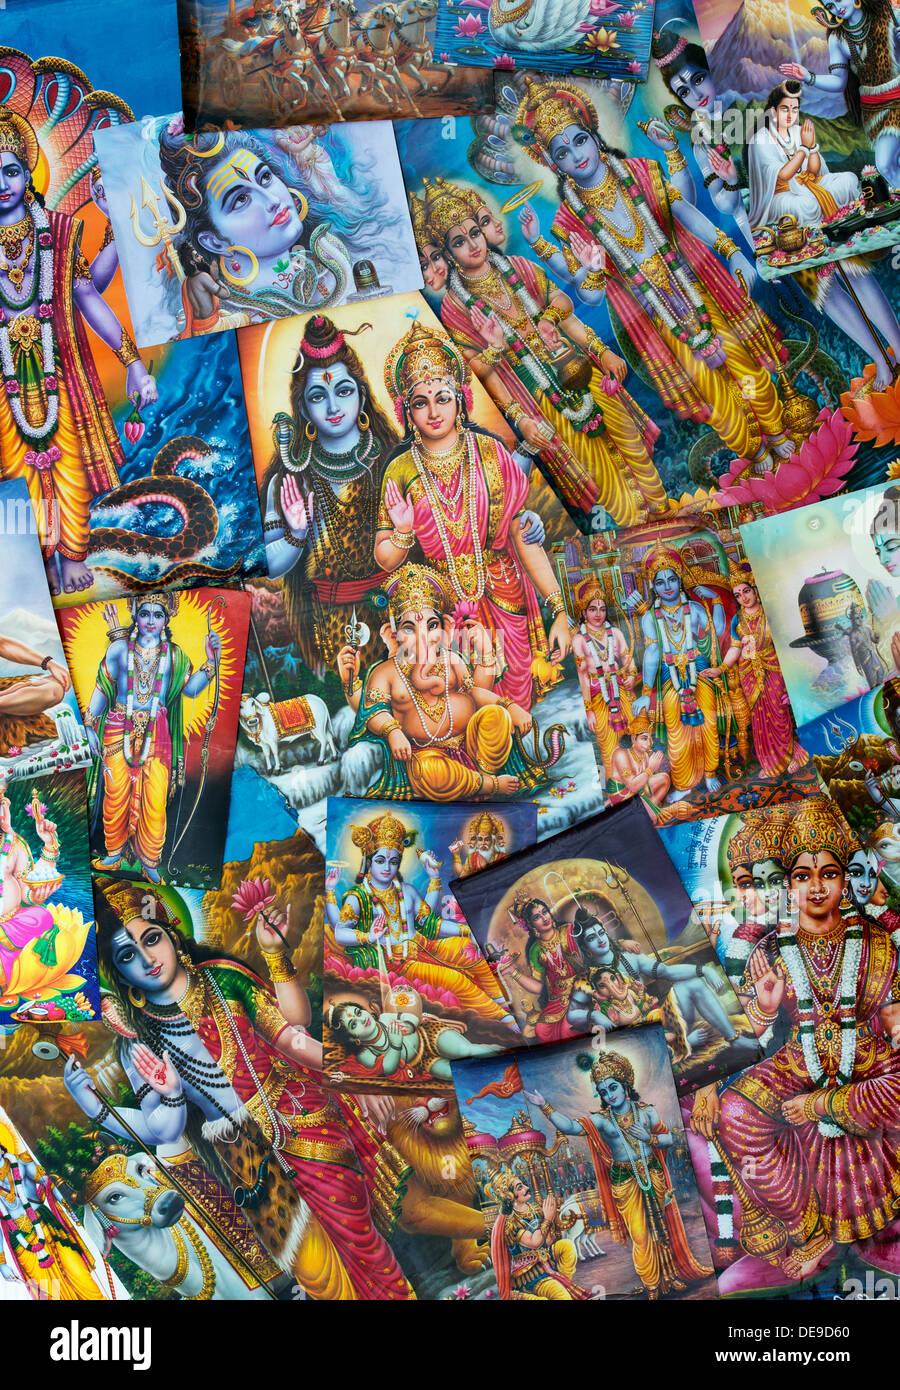 Indian Deities on Hindu posters - Stock Image